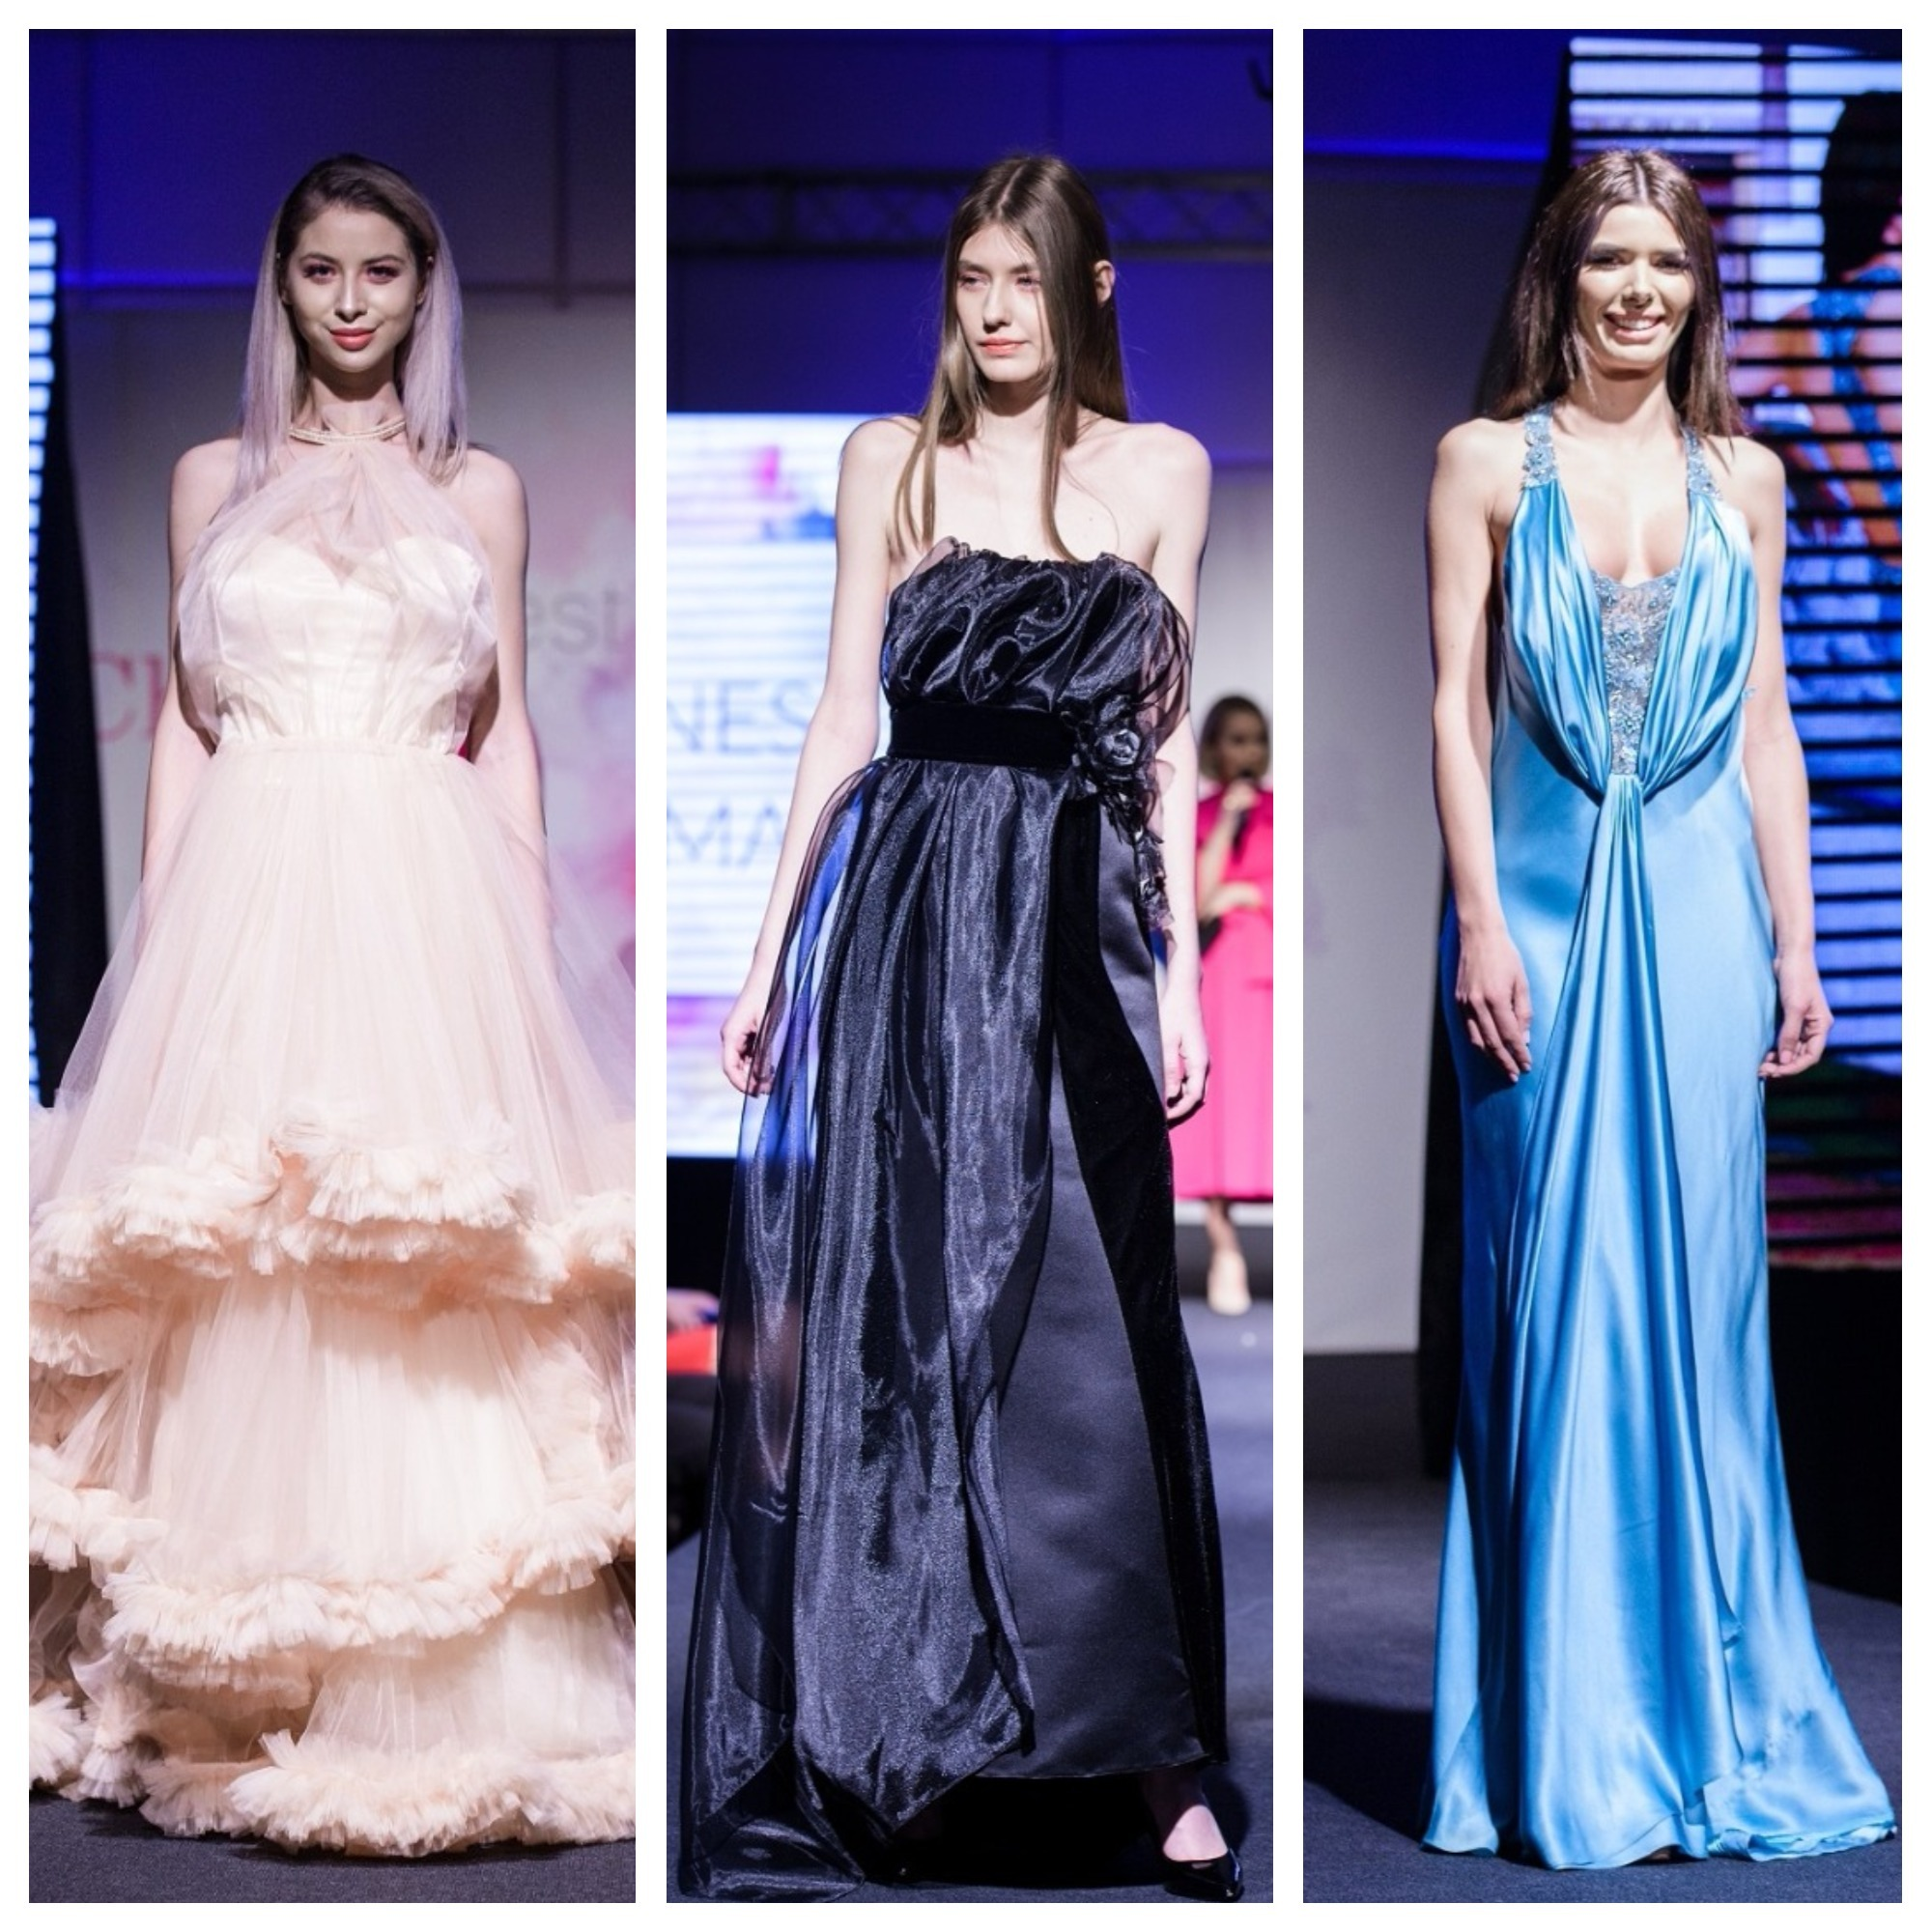 Bucharest Charity Fashion Show: rochii de designer licitate cu mii de euro